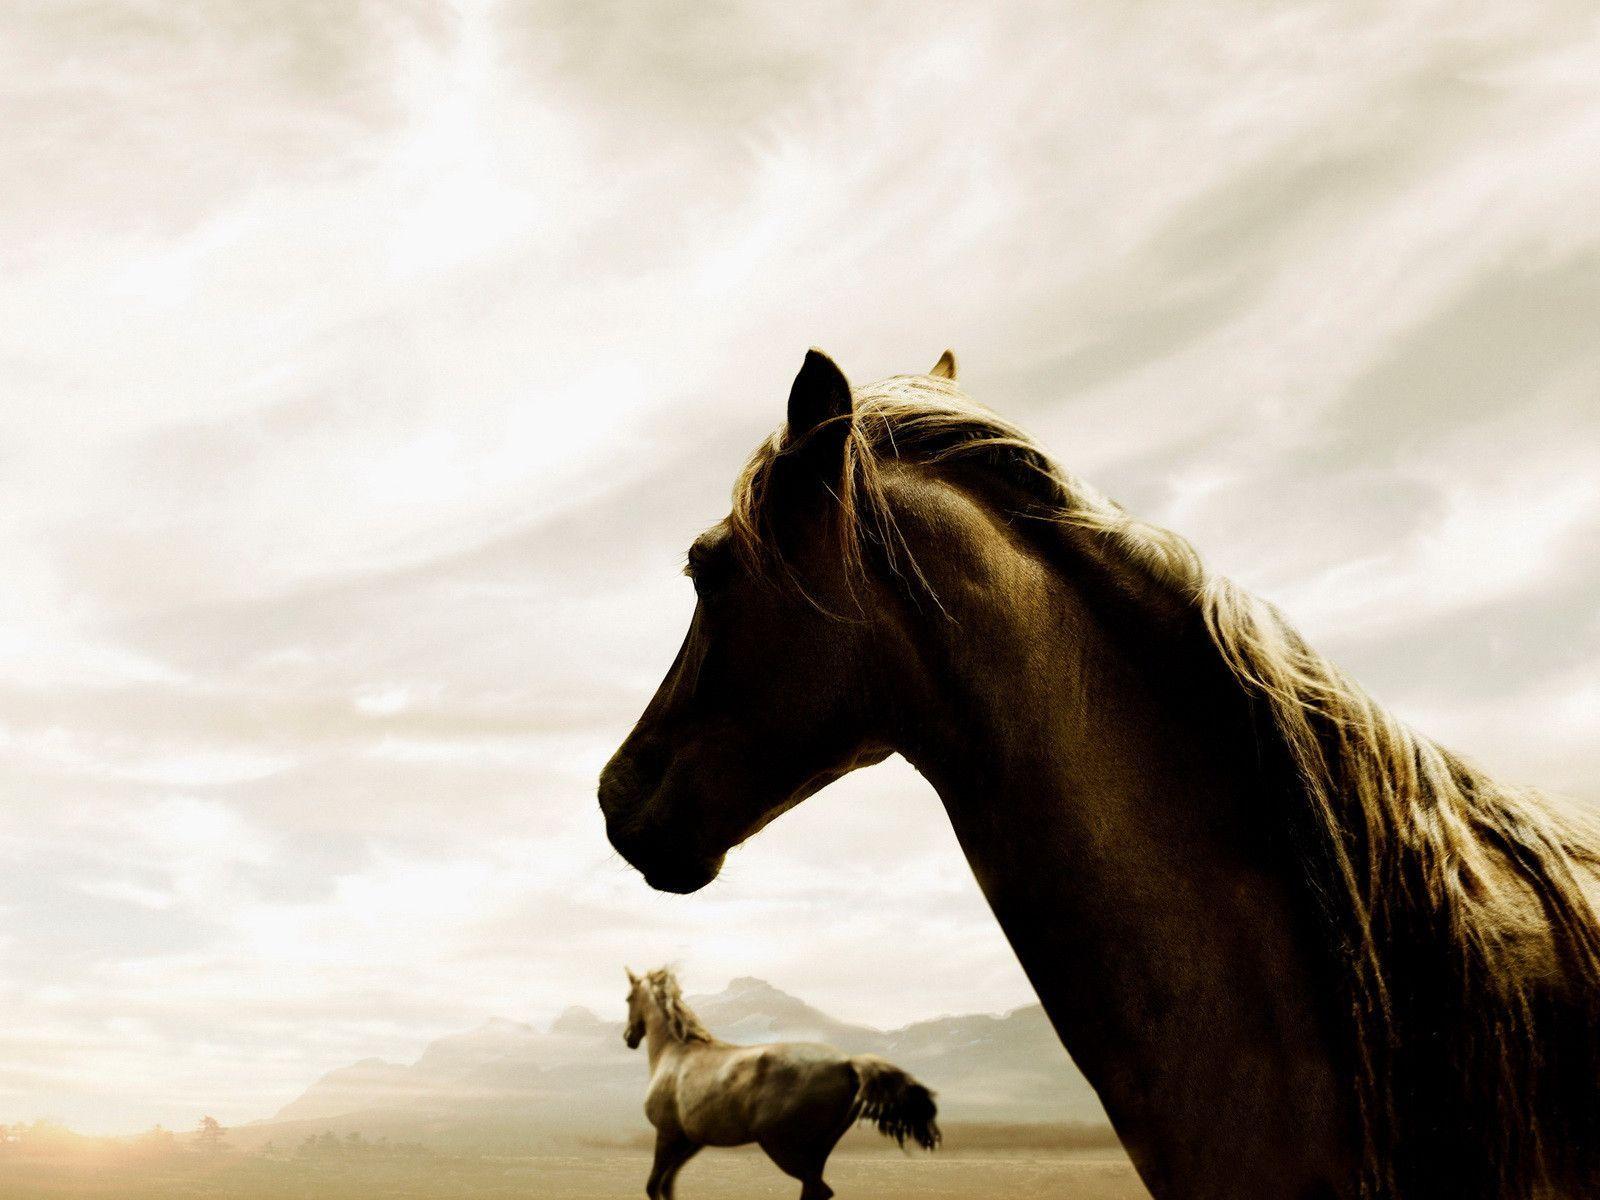 Cool Wallpaper Horse Samsung Galaxy - 60d3d9f334a4fca868c8c22bc84d41fd  Snapshot_381134.jpg